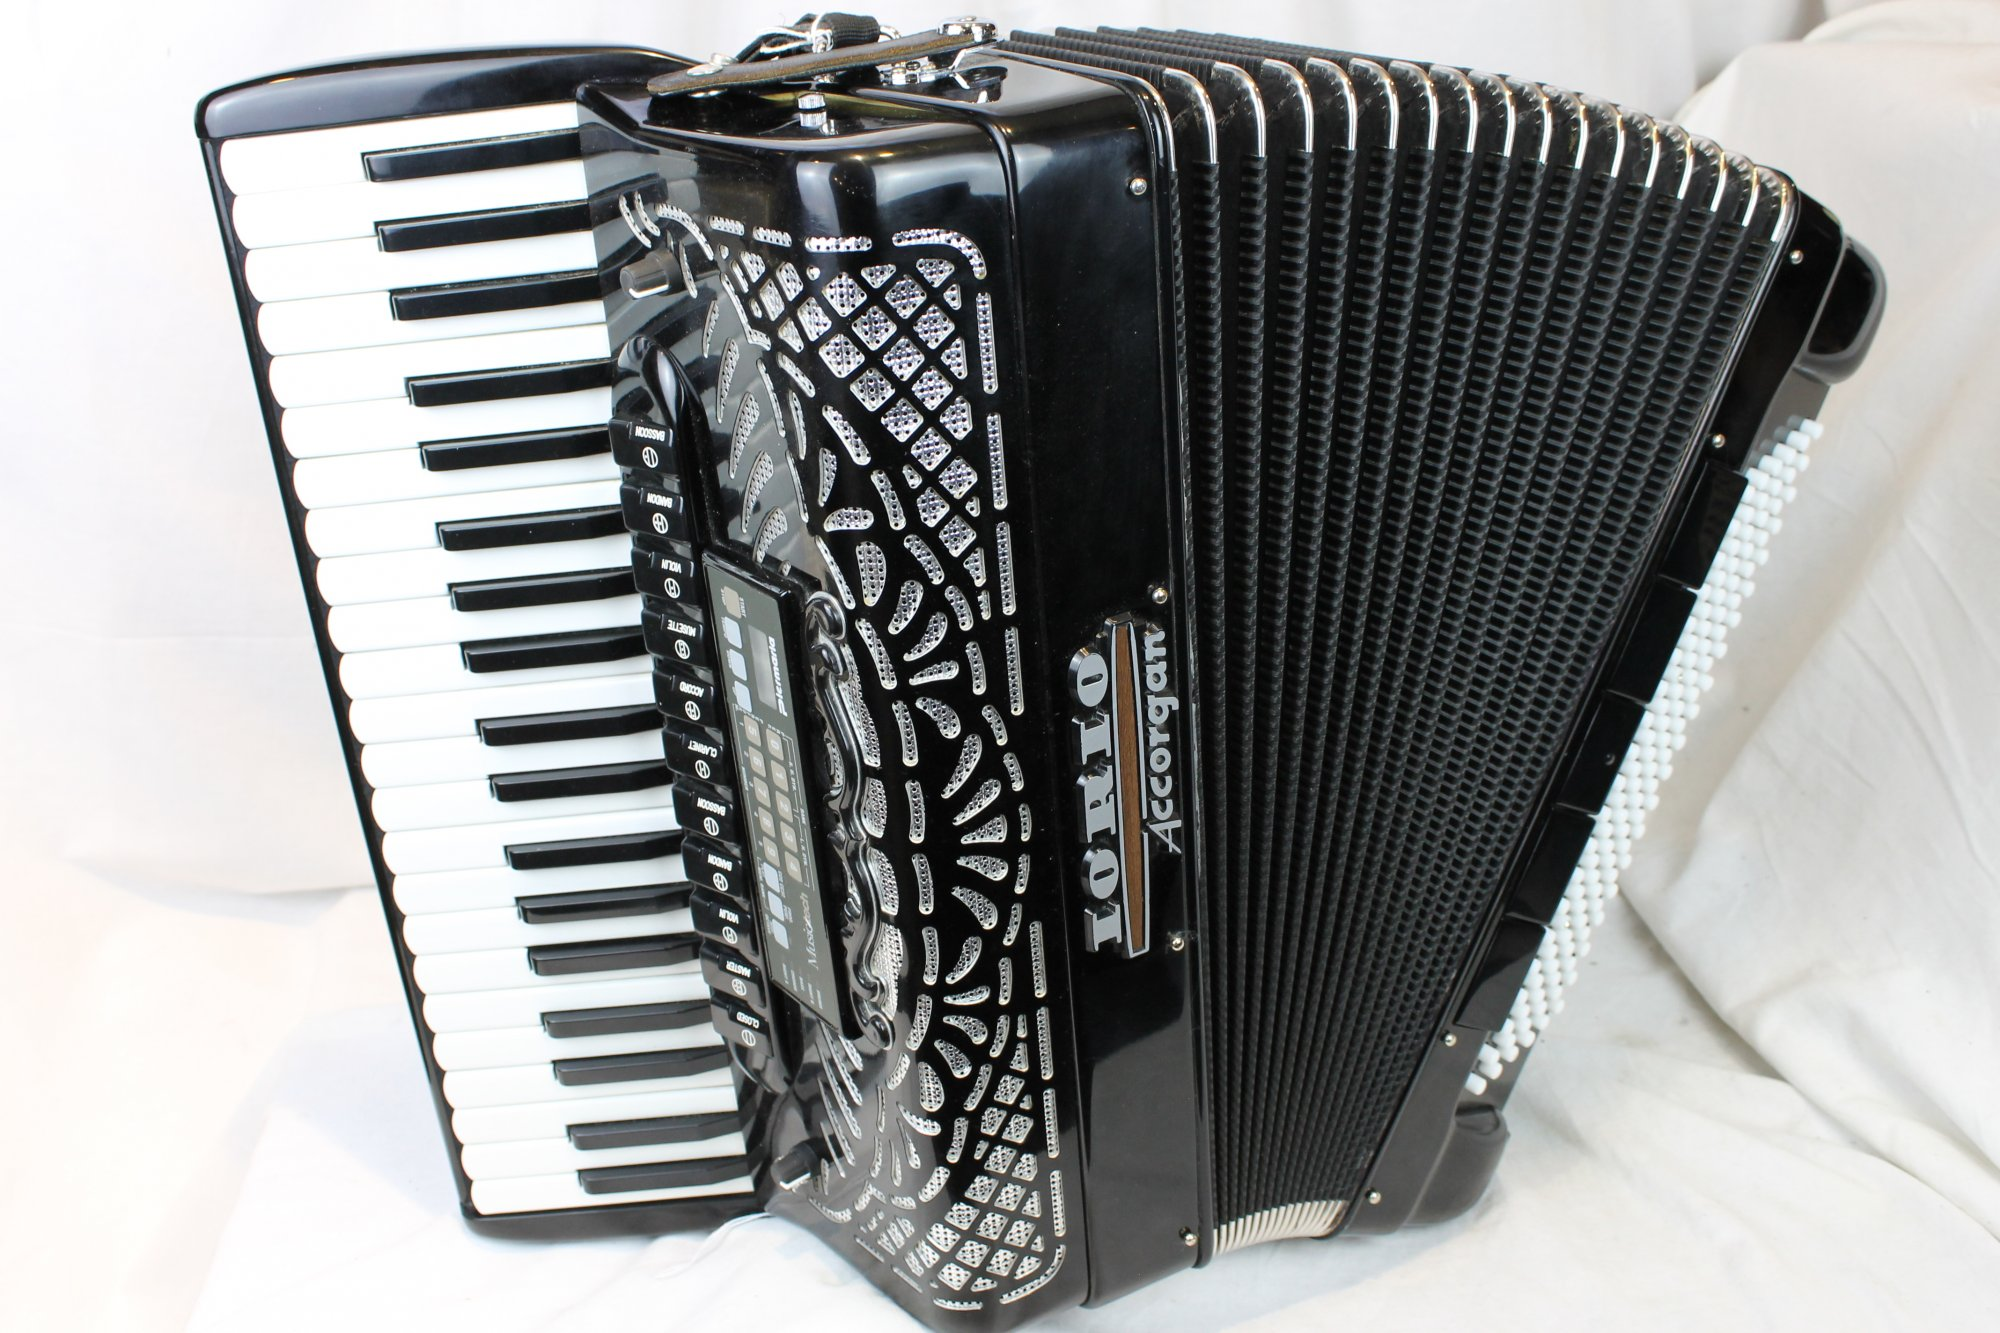 3709 - Black Iorio Accorgan KS 500 Piano Accordion LMMM 41 120